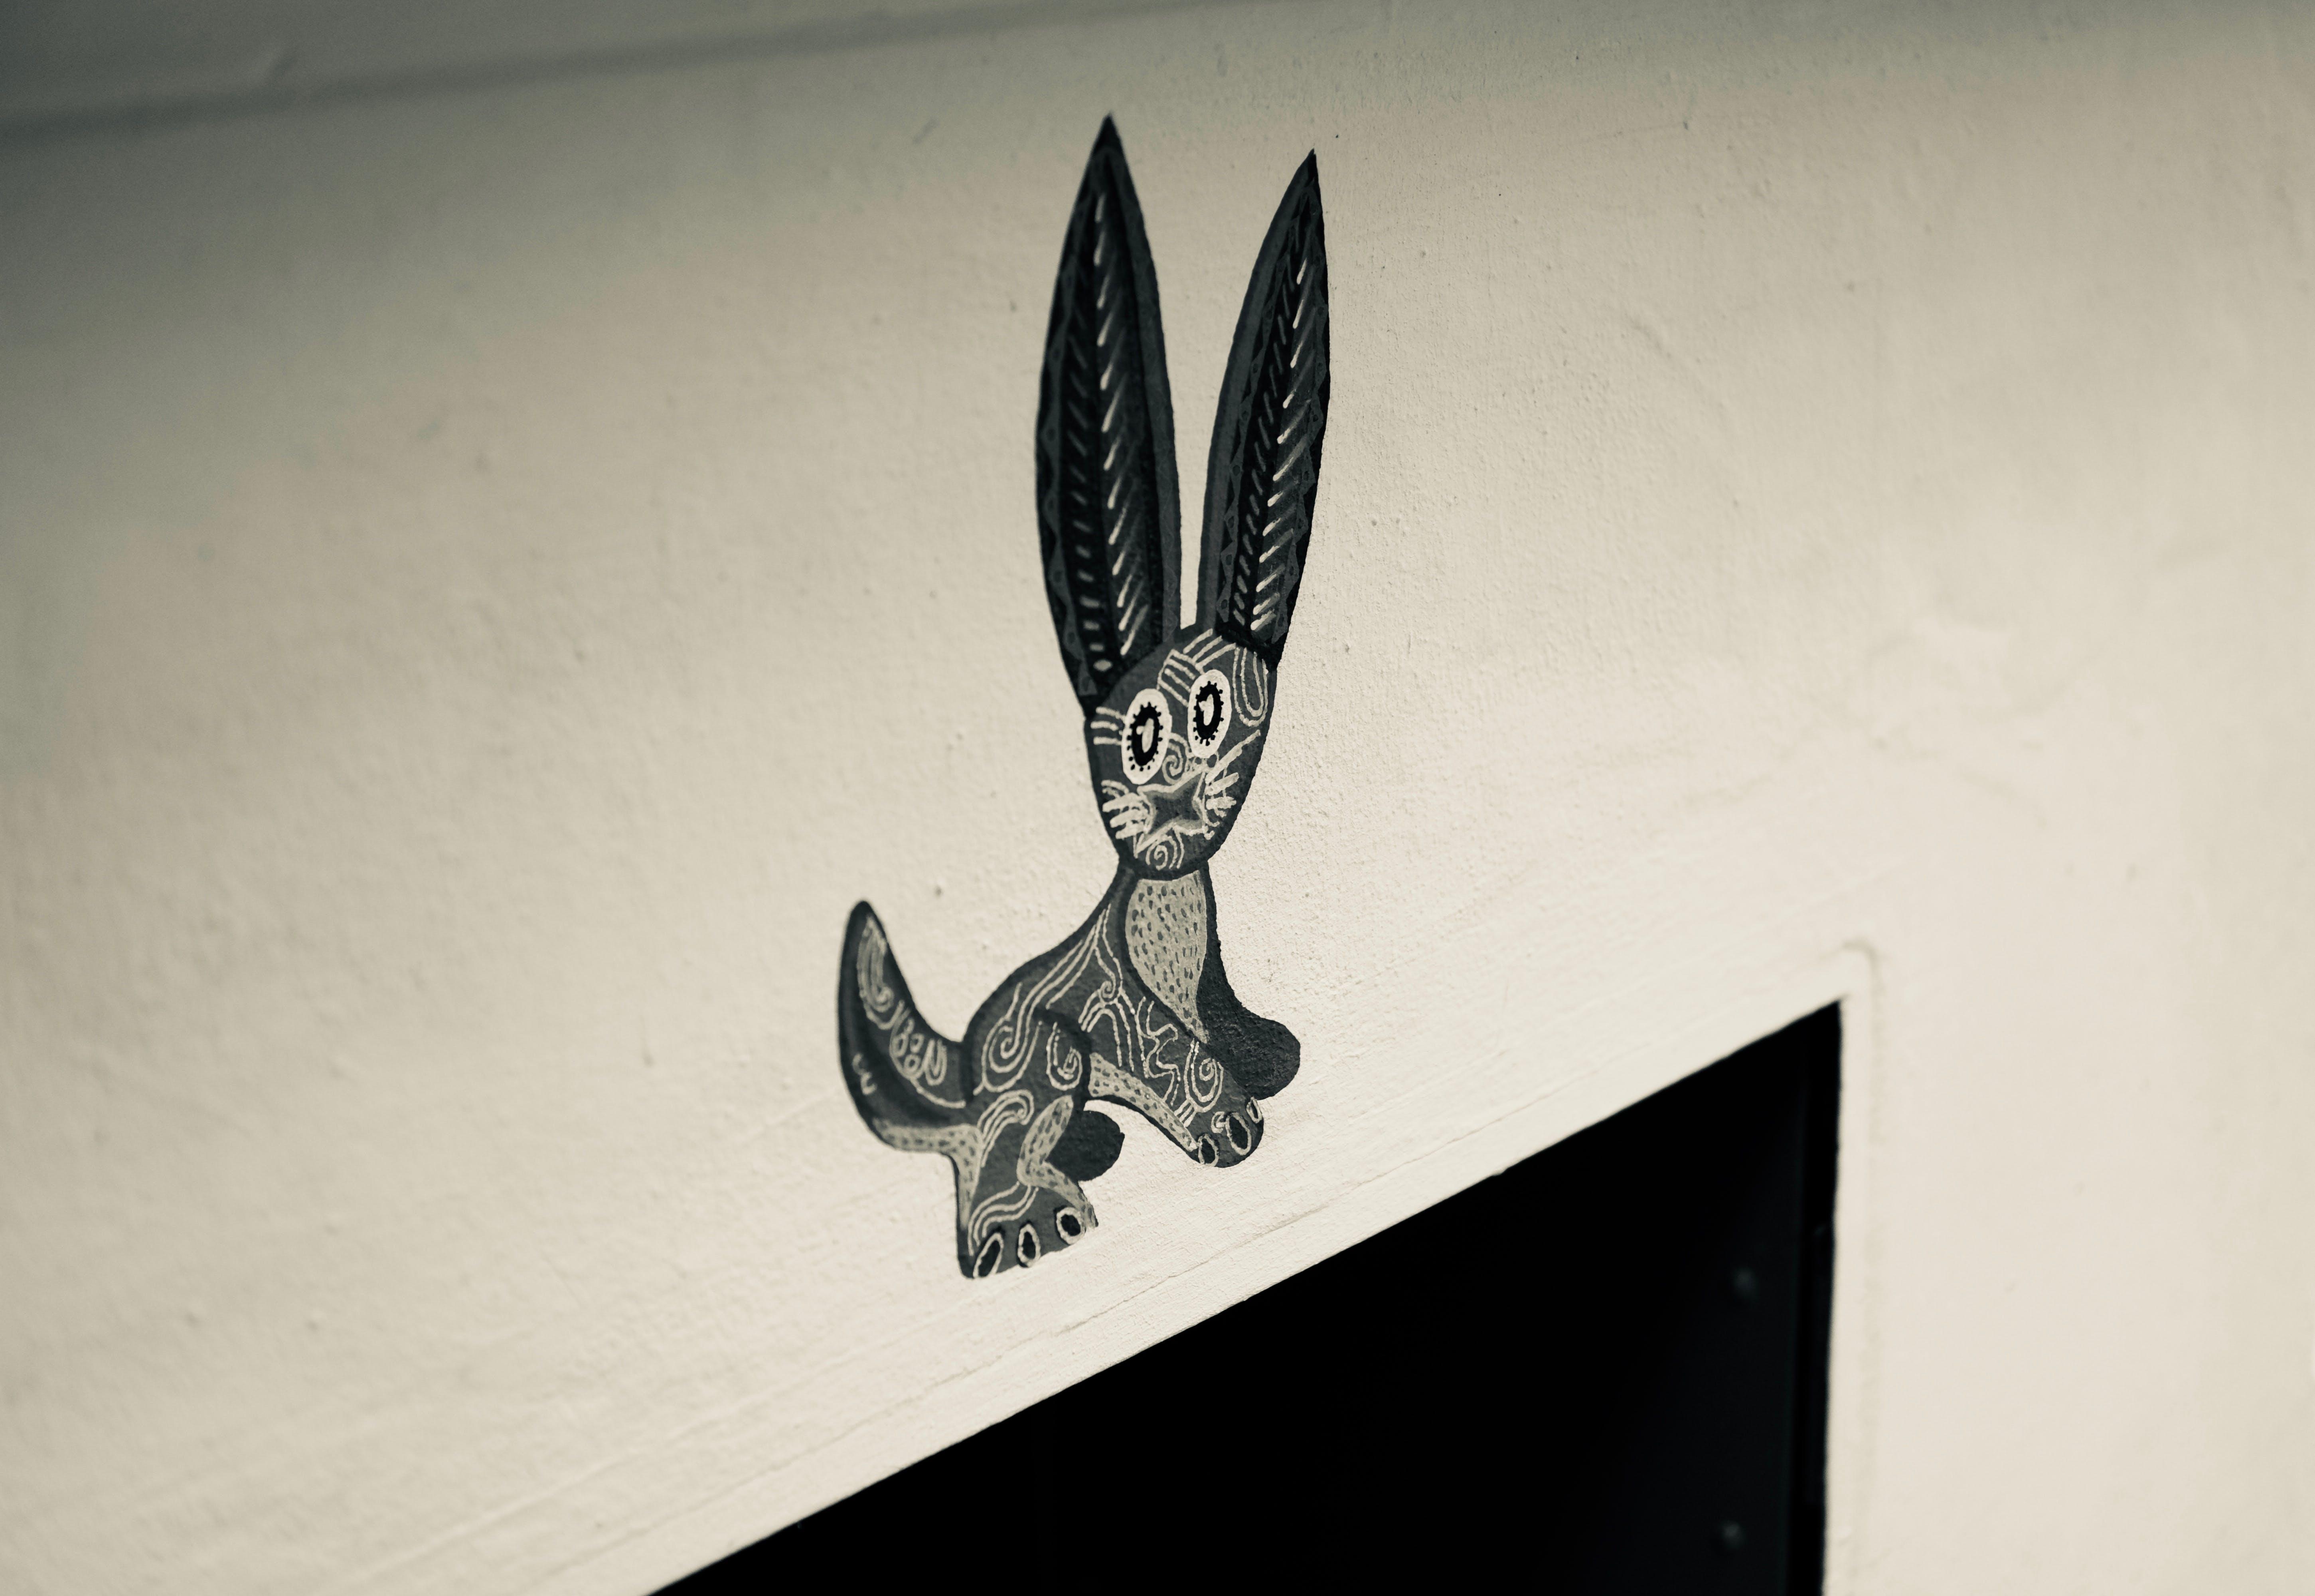 Free stock photo of art, street art, wall art, rabbit